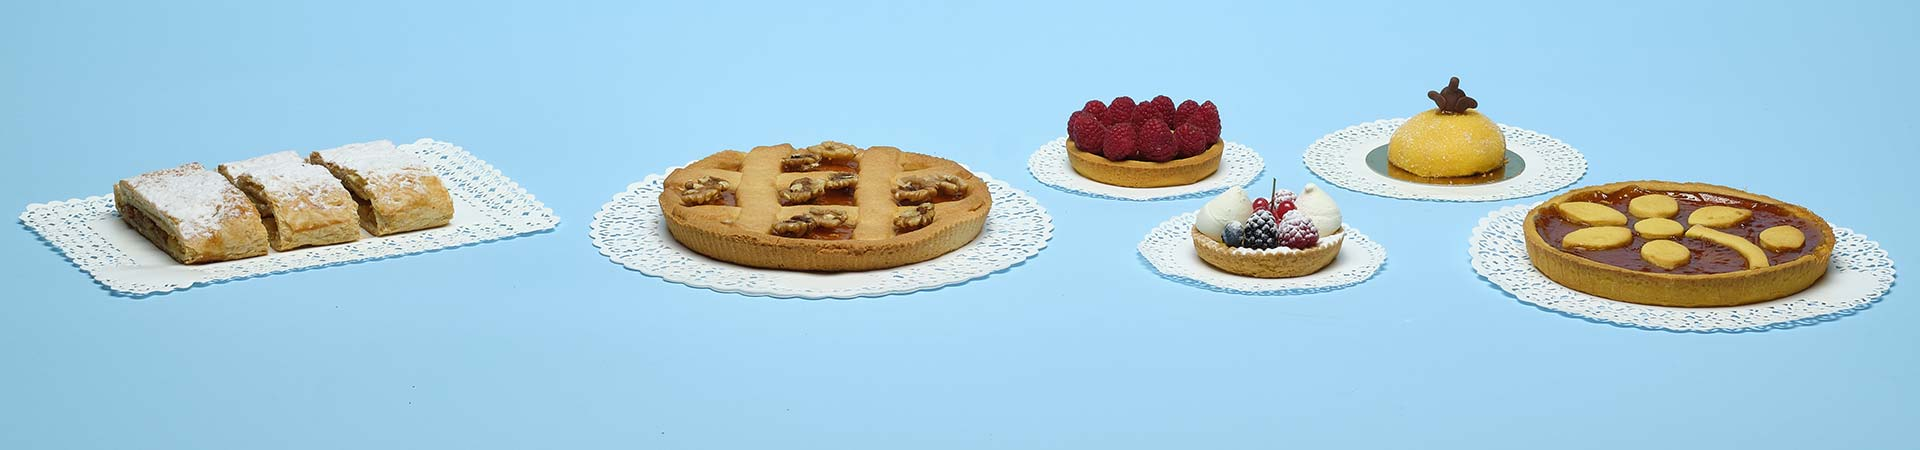 Novacart paper doilies for cakes